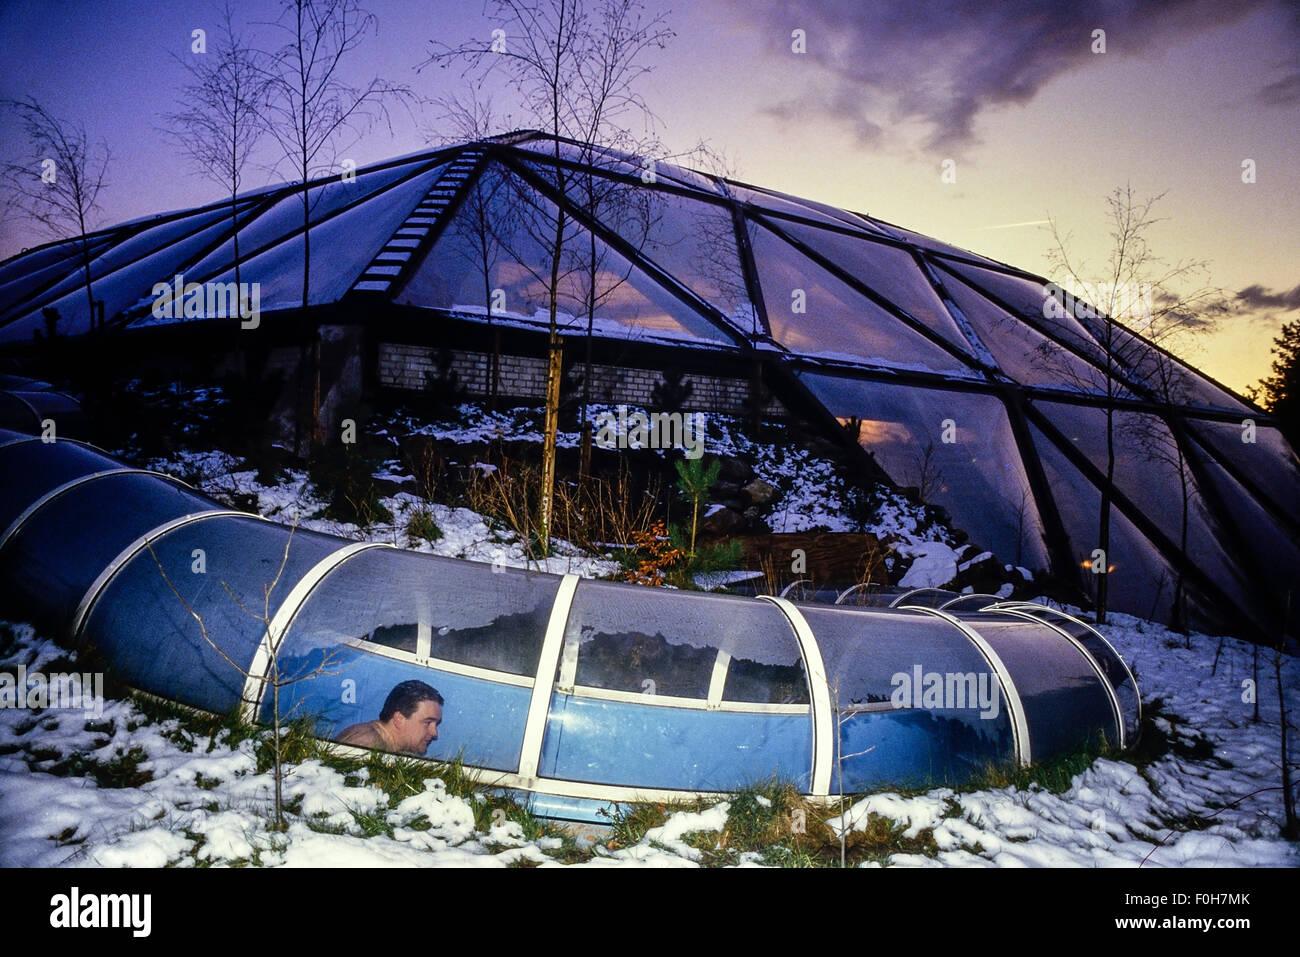 Subtropical swimming paradise sherwood forest center Center parcs elveden forest swimming pool